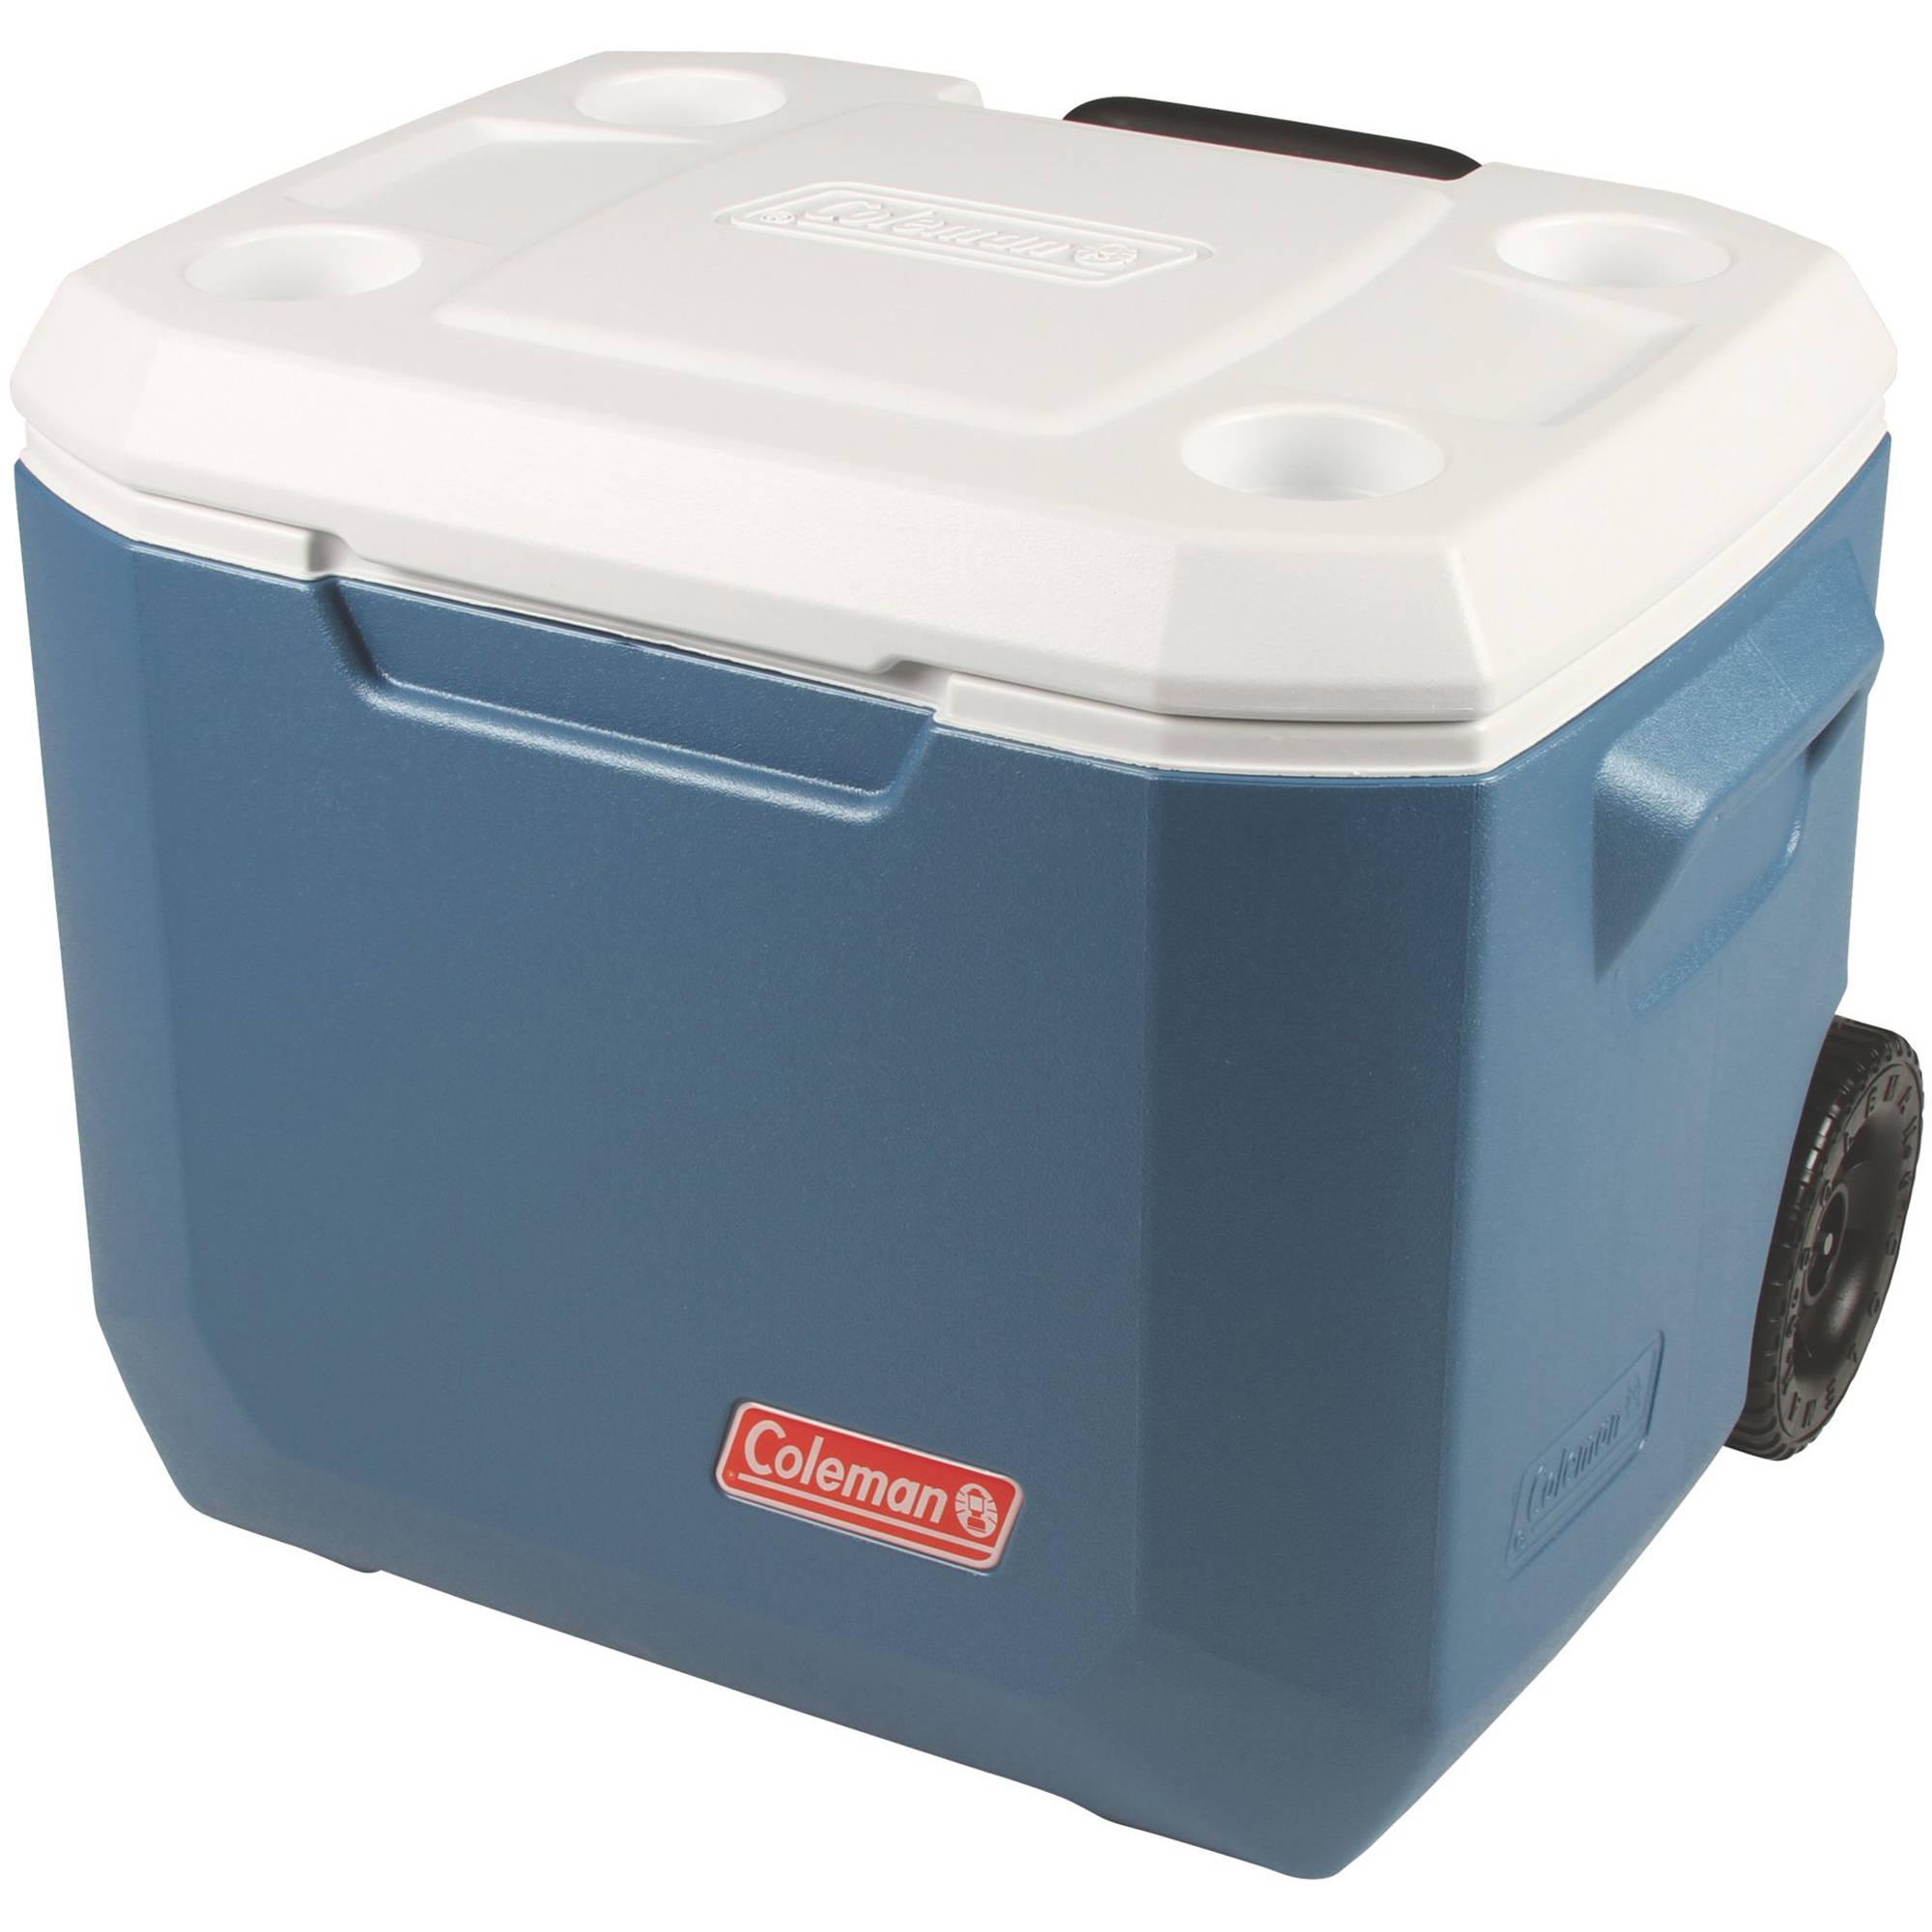 Coleman Xtreme 5 Cooler : Coleman xtreme quart wheeled cooler b h photo